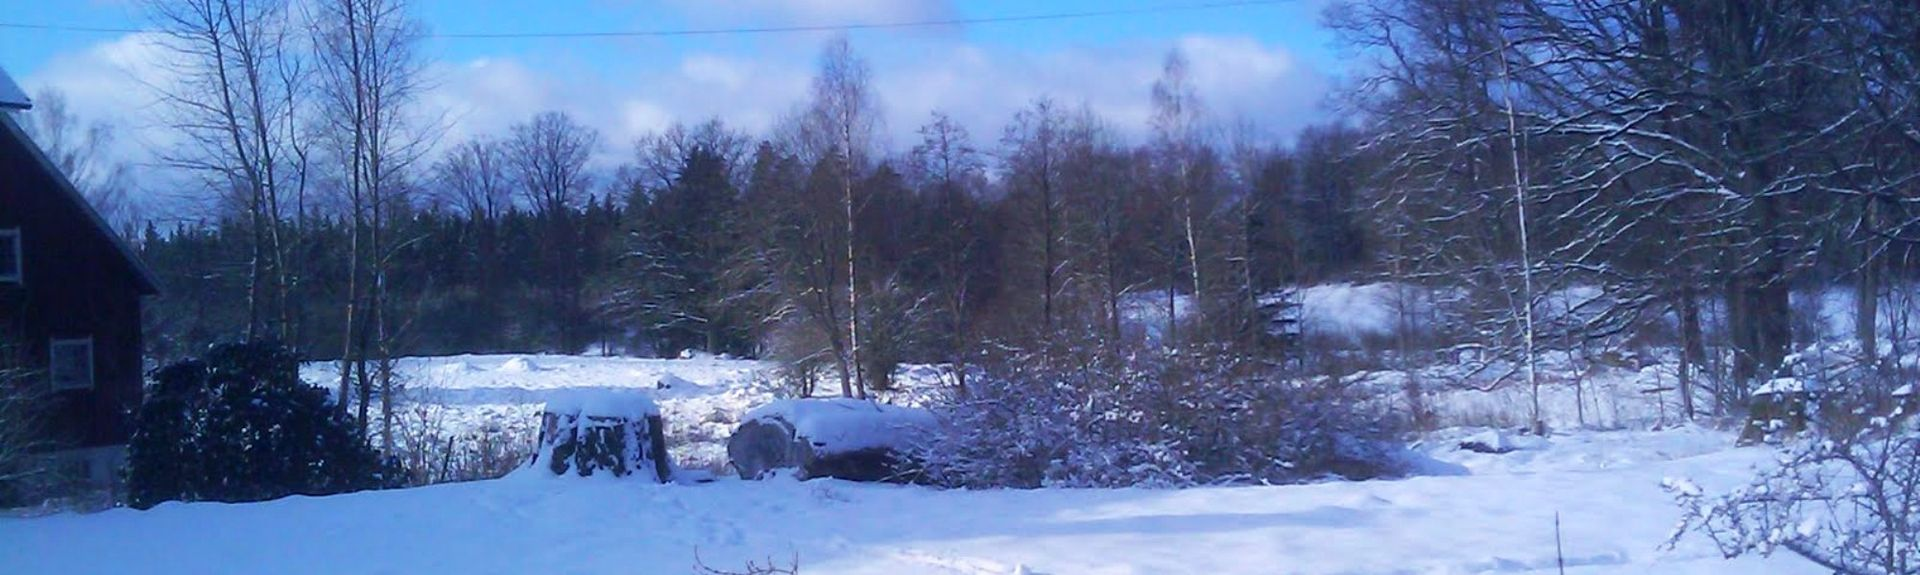 Geranium House at Elders Farm, Scania, Sweden